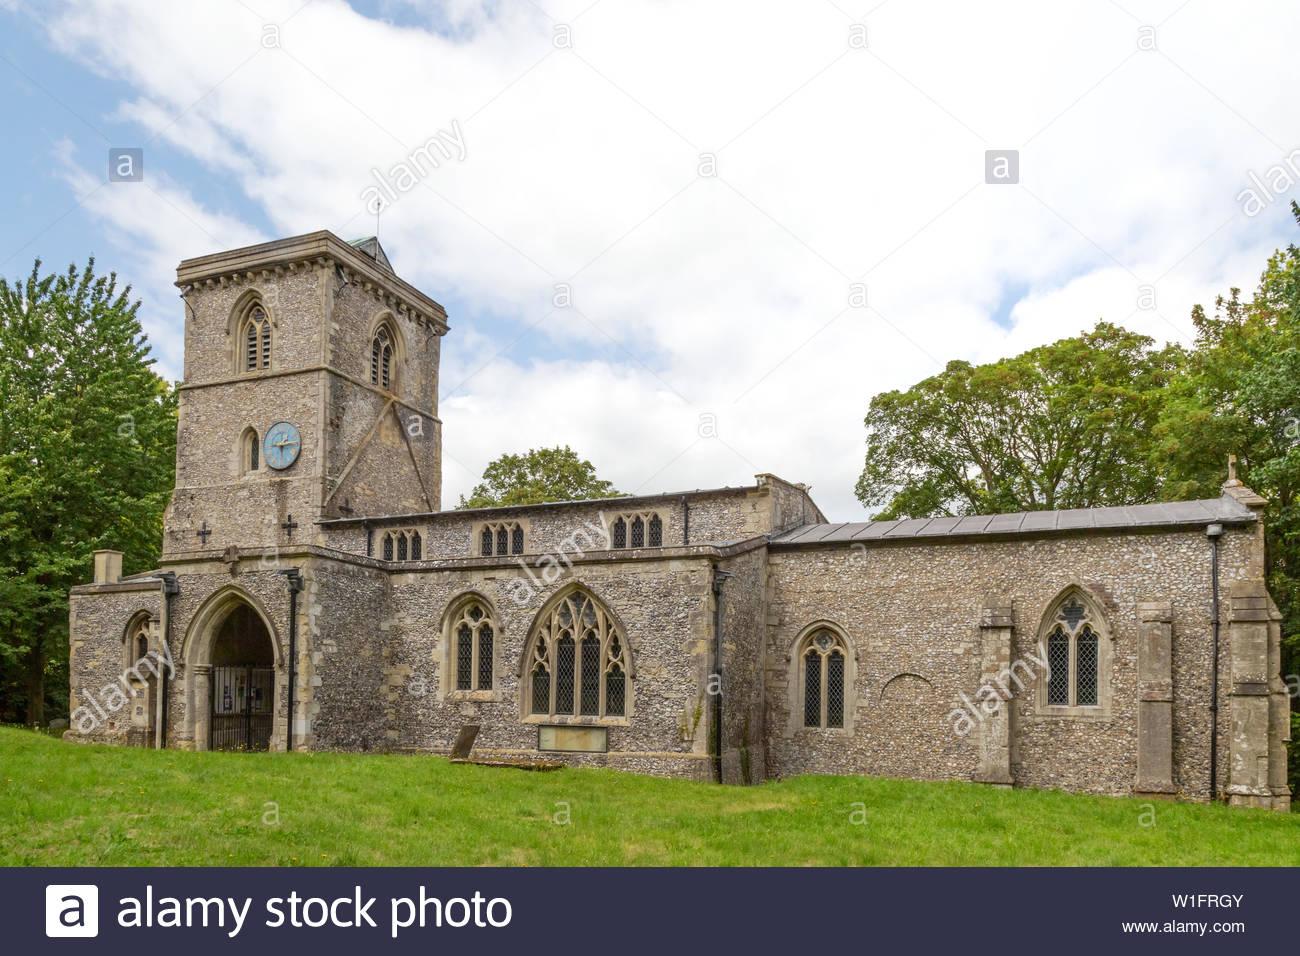 Bledlow Buckinghamshire - Holy Trinity Church, Bledlow village, Aylesbury Vale, Buckinghamshire UK - Stock Image